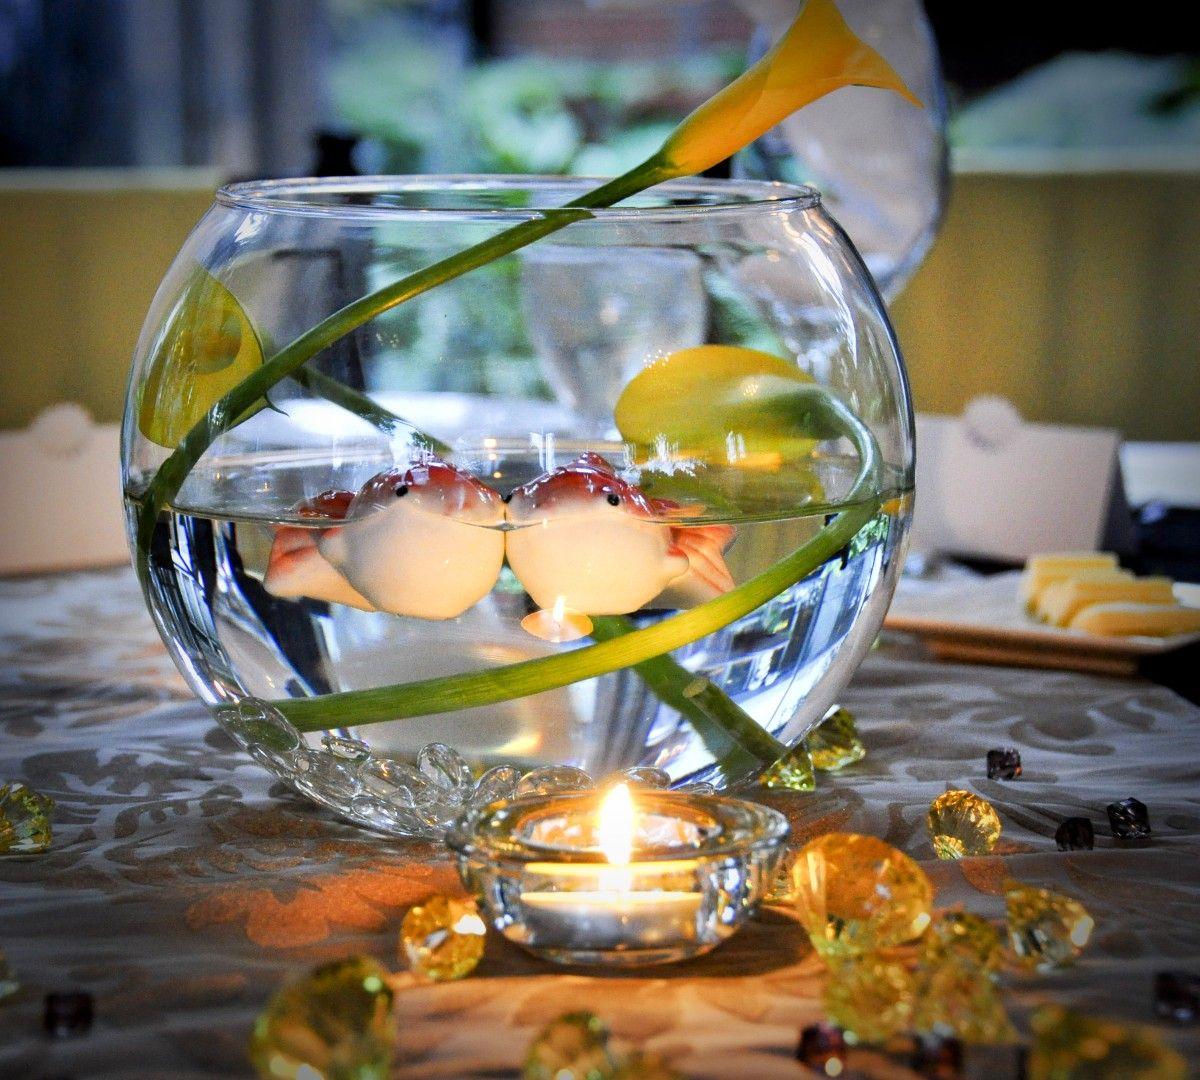 Fish Bowl Centerpiece Fishing Themed Wedding Ideas Wedding